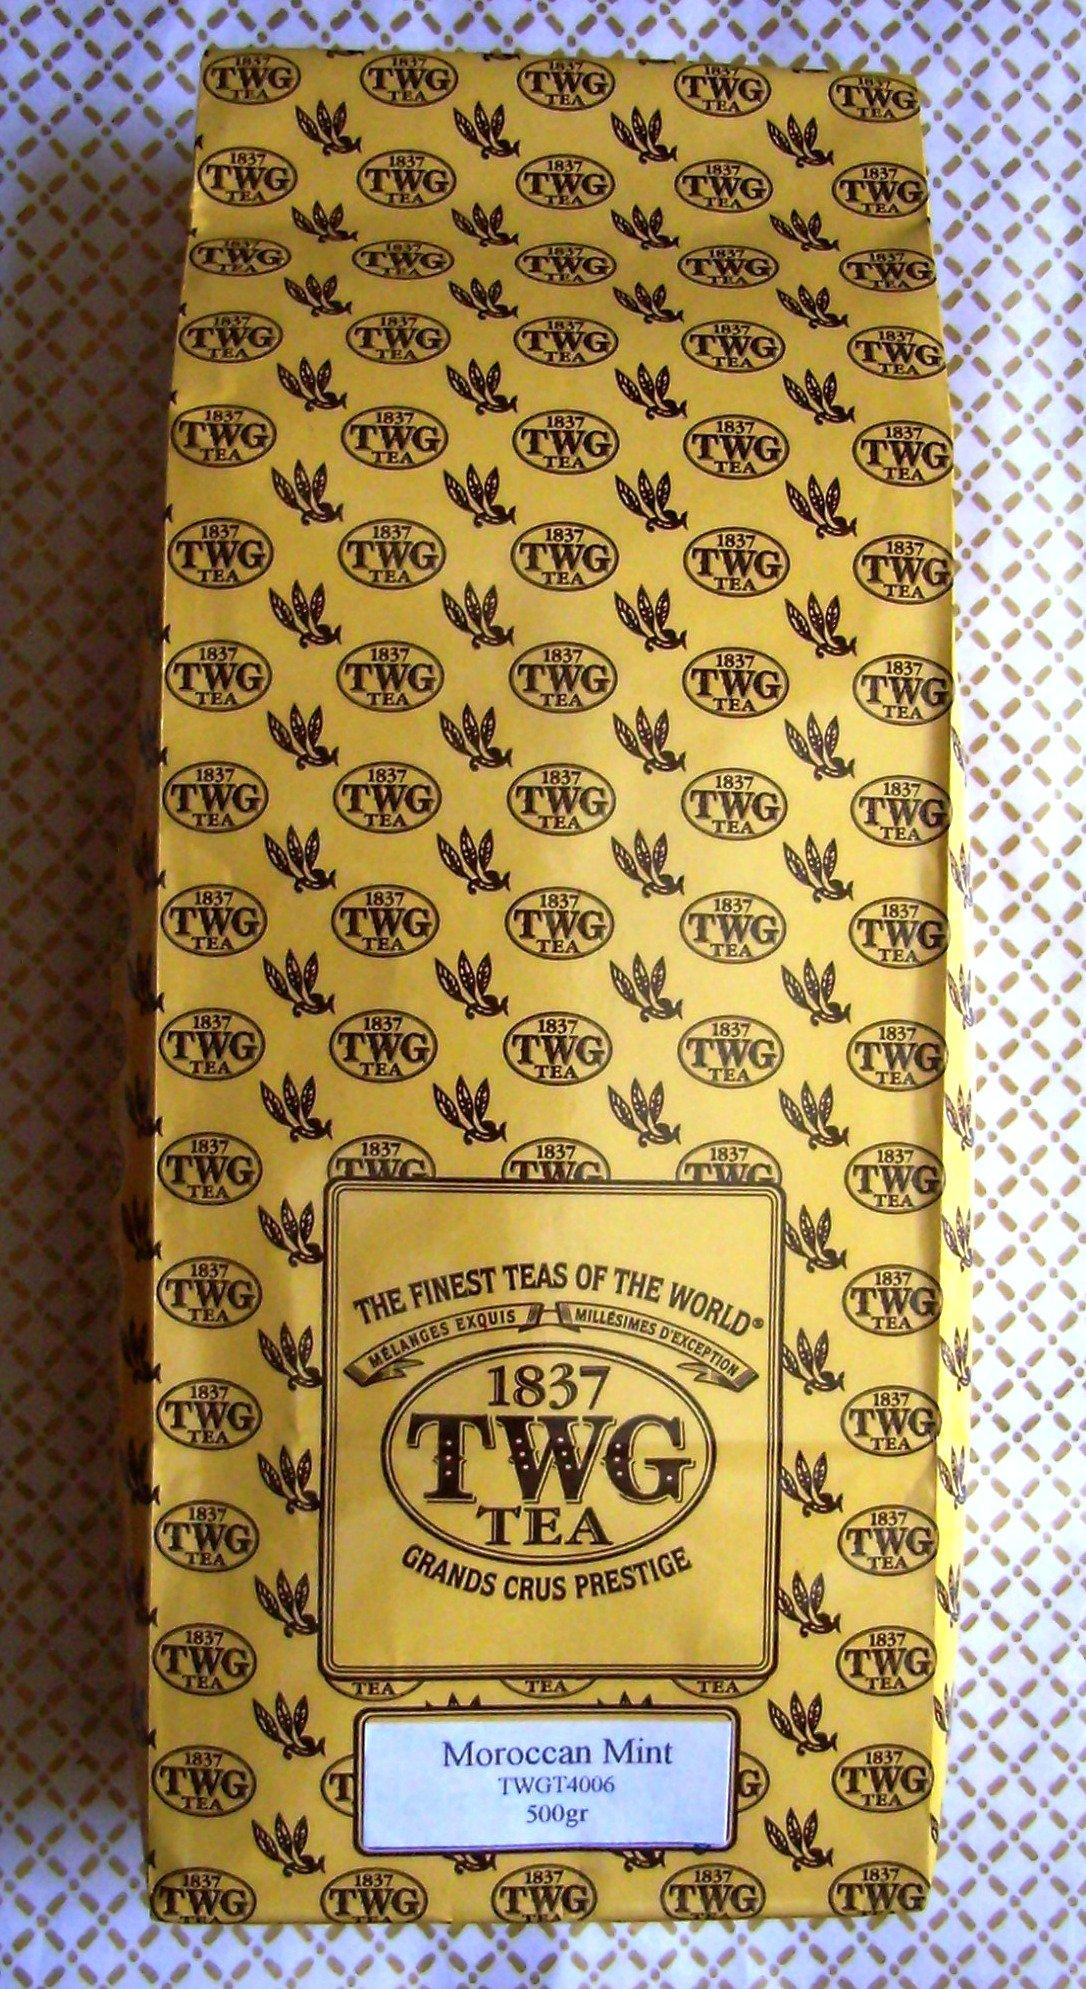 TWG Tea - Moroccan Mint Tea (TWGT4006) - 17.63oz / 500gr Loose Leaf BULK BAG by Unknown (Image #1)